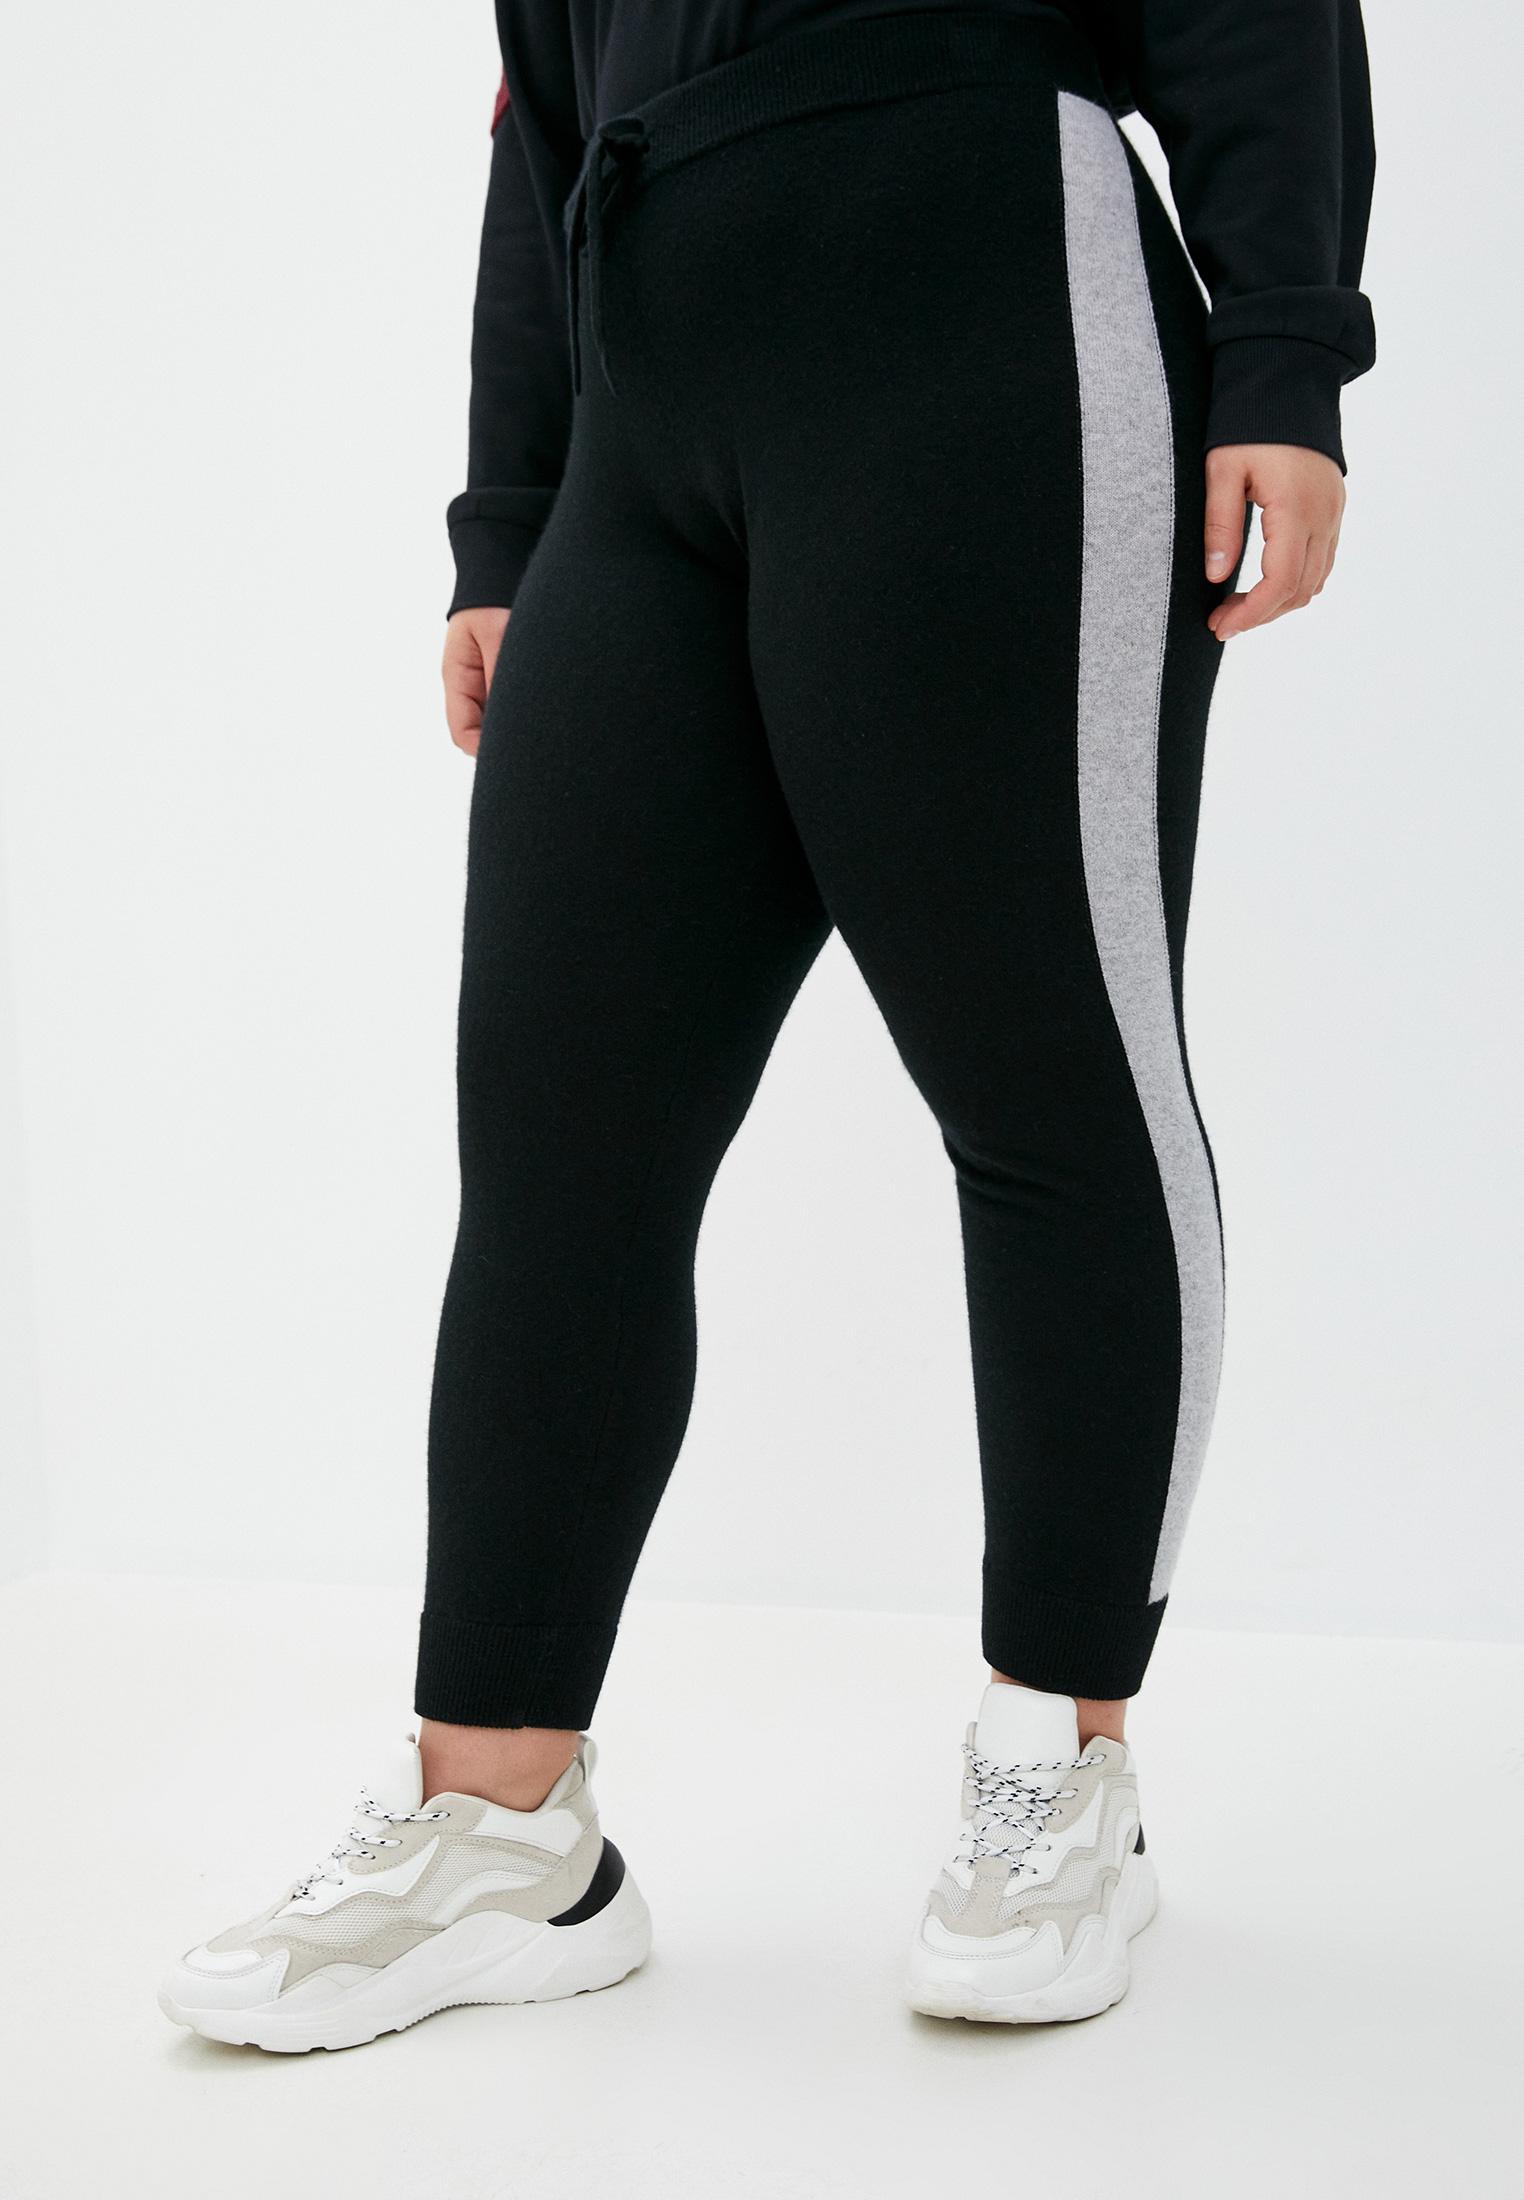 Женские спортивные брюки Juicy Couture (Джуси Кутюр) WFSB117167